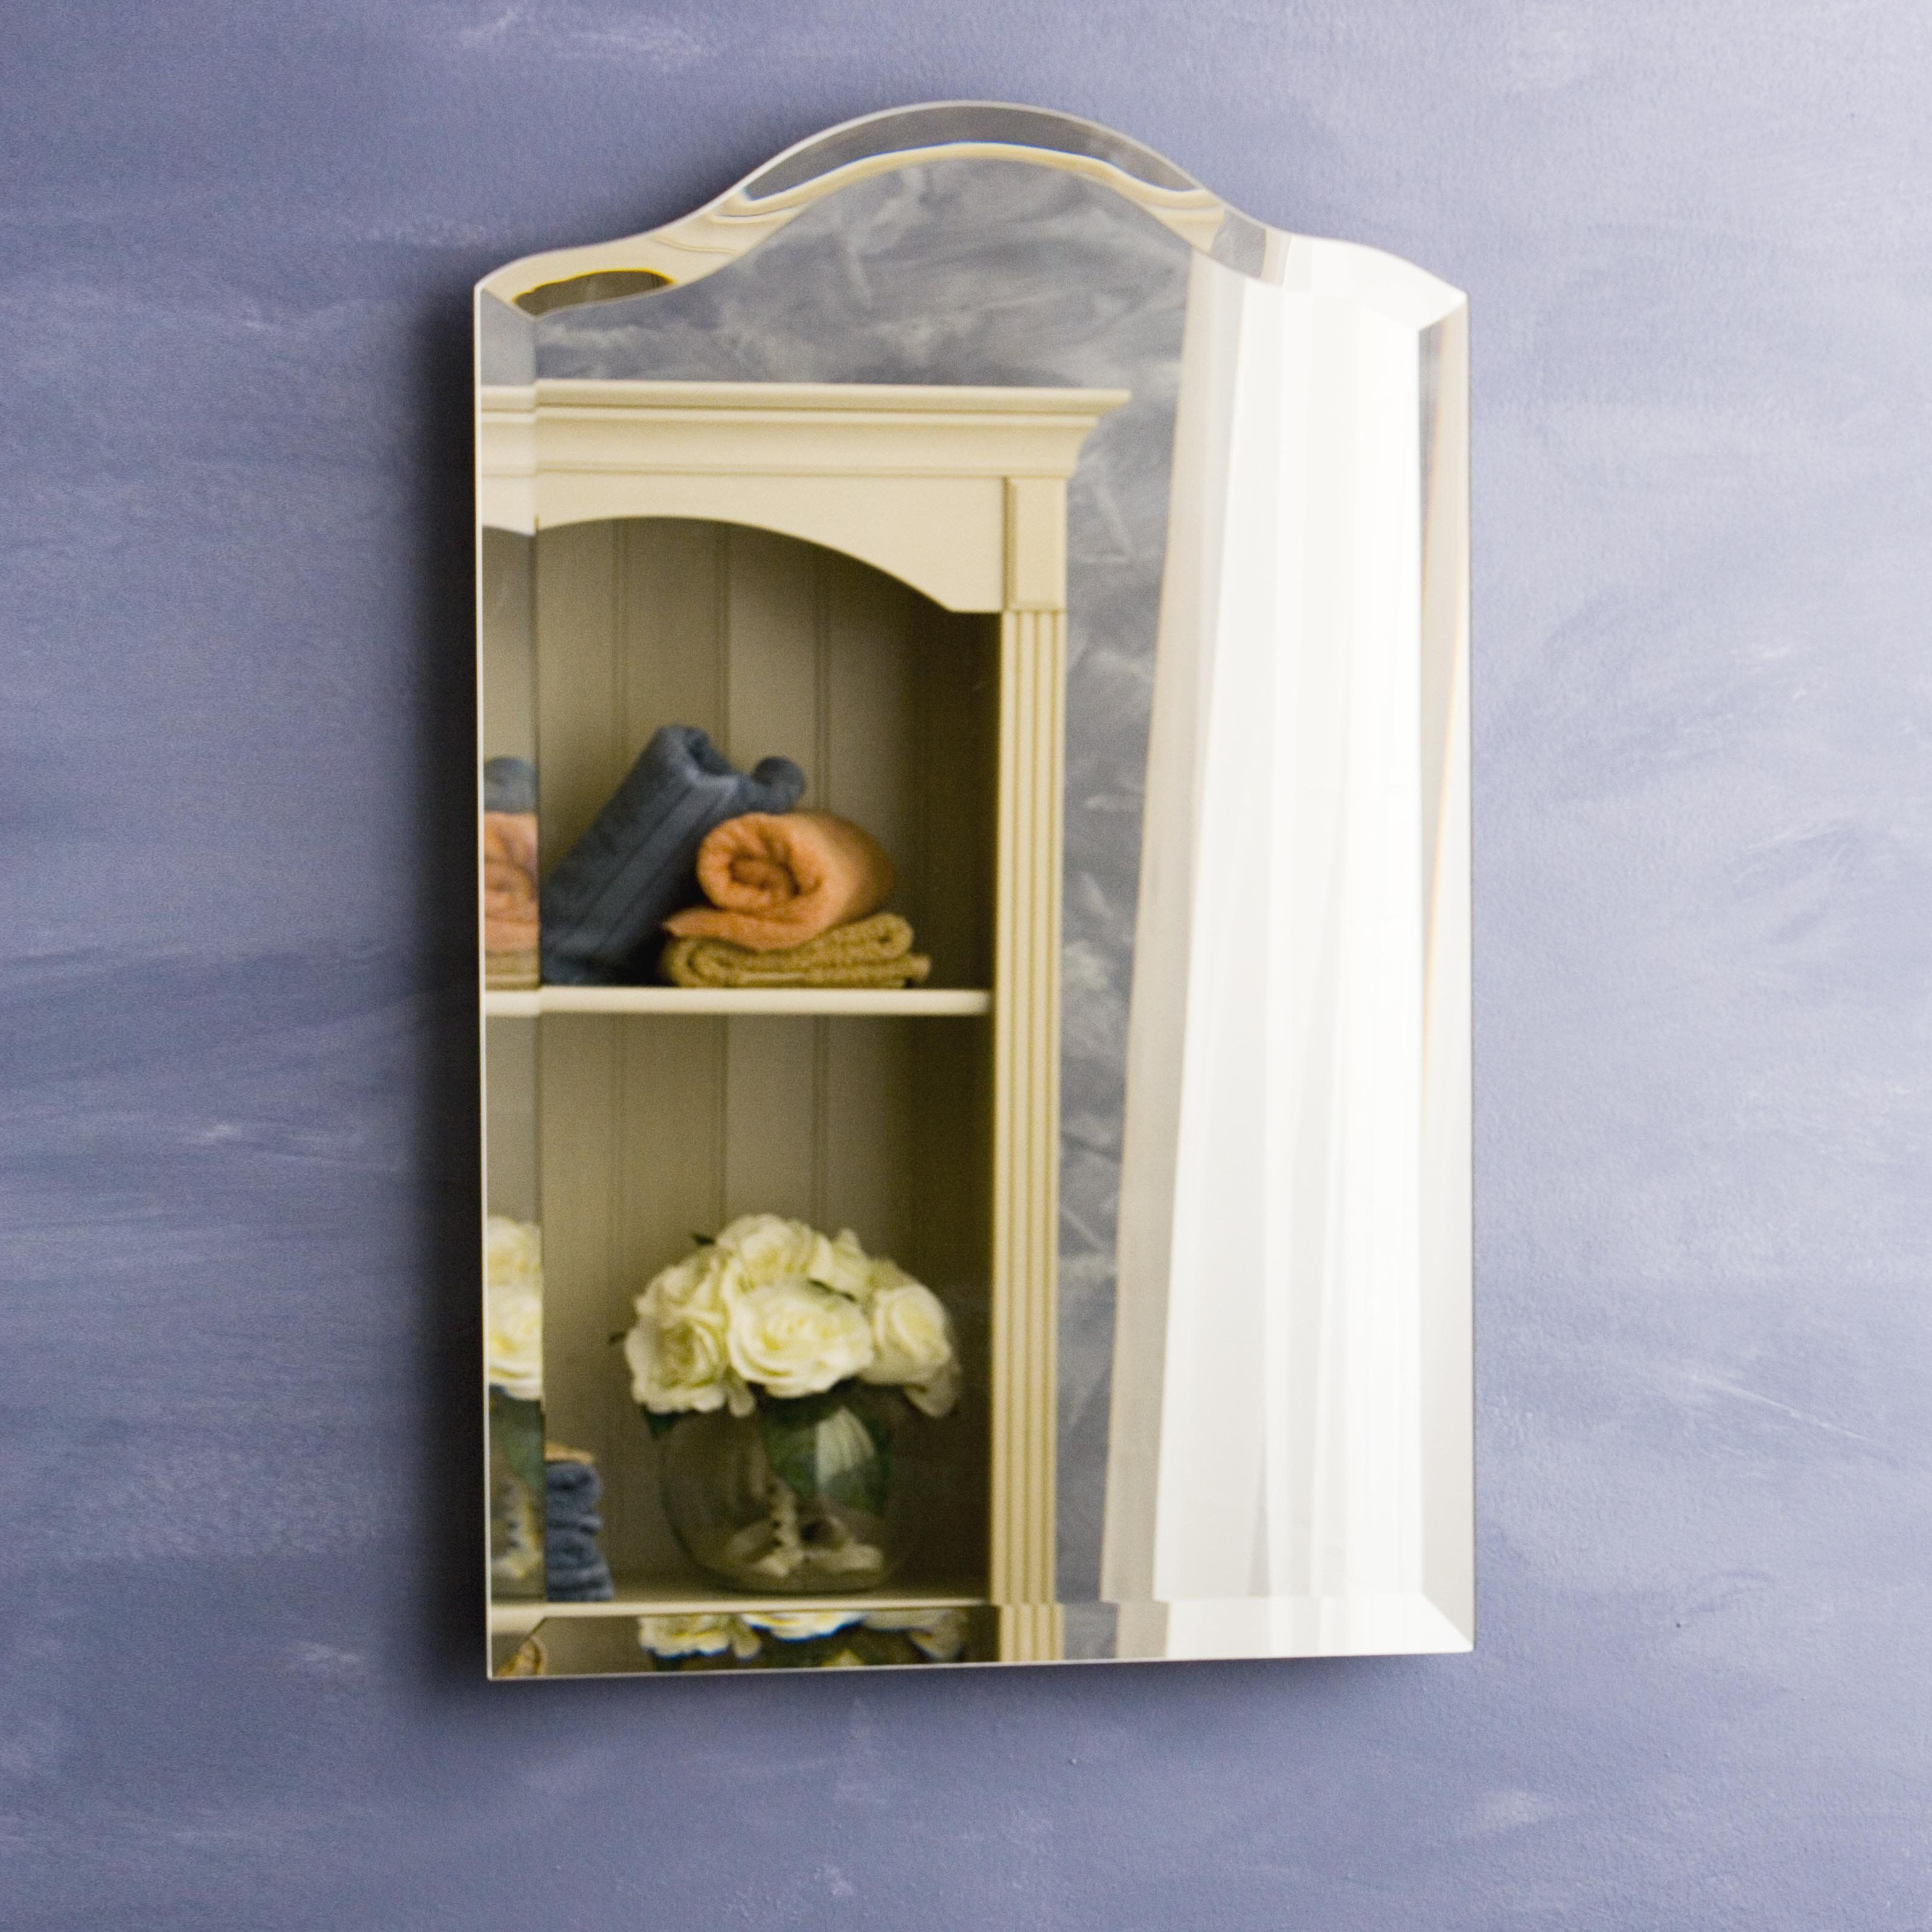 Luxury Afina Arch top Medicine Cabinet